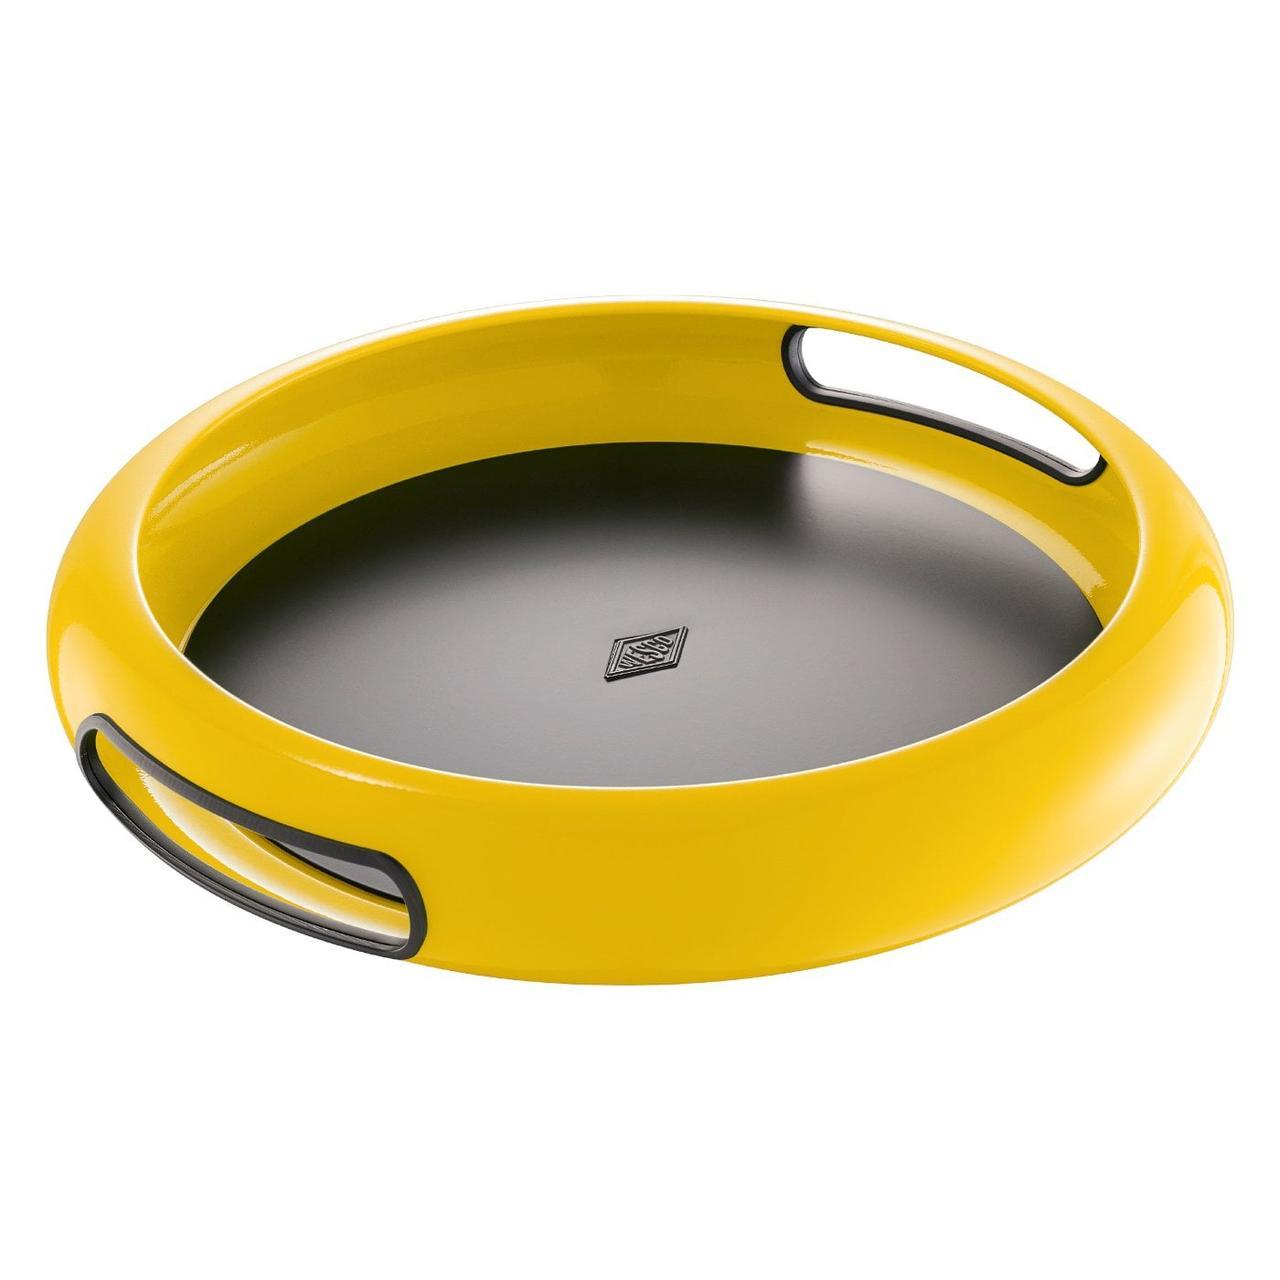 Поднос круглый Wesco Spasy Tray желтый 322101-19